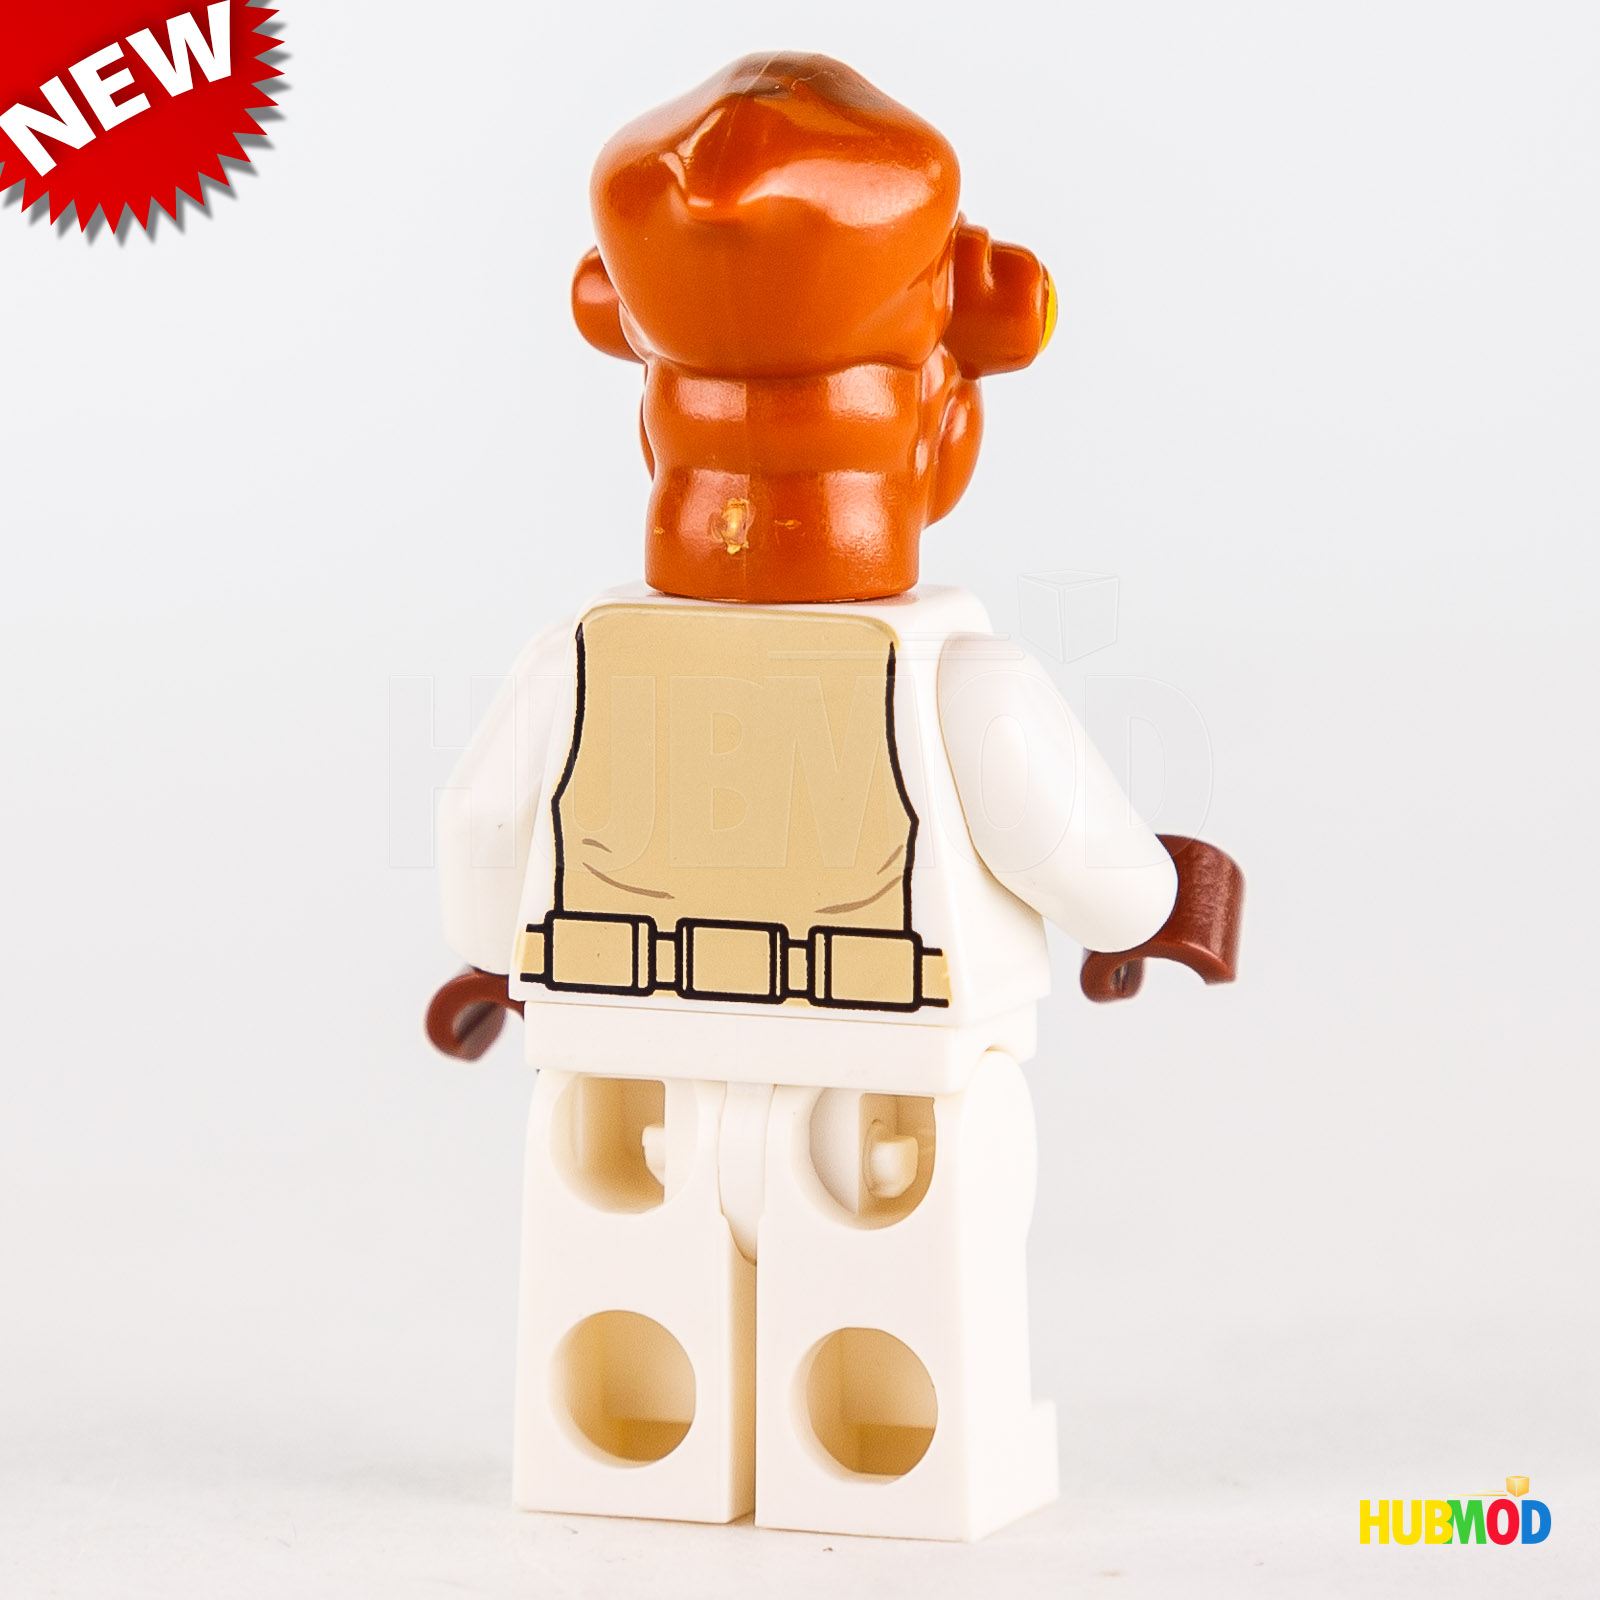 NEW Lego Admiral Ackbar Minifigure Minifig Figure Star Wars 70503 7754 Calamari